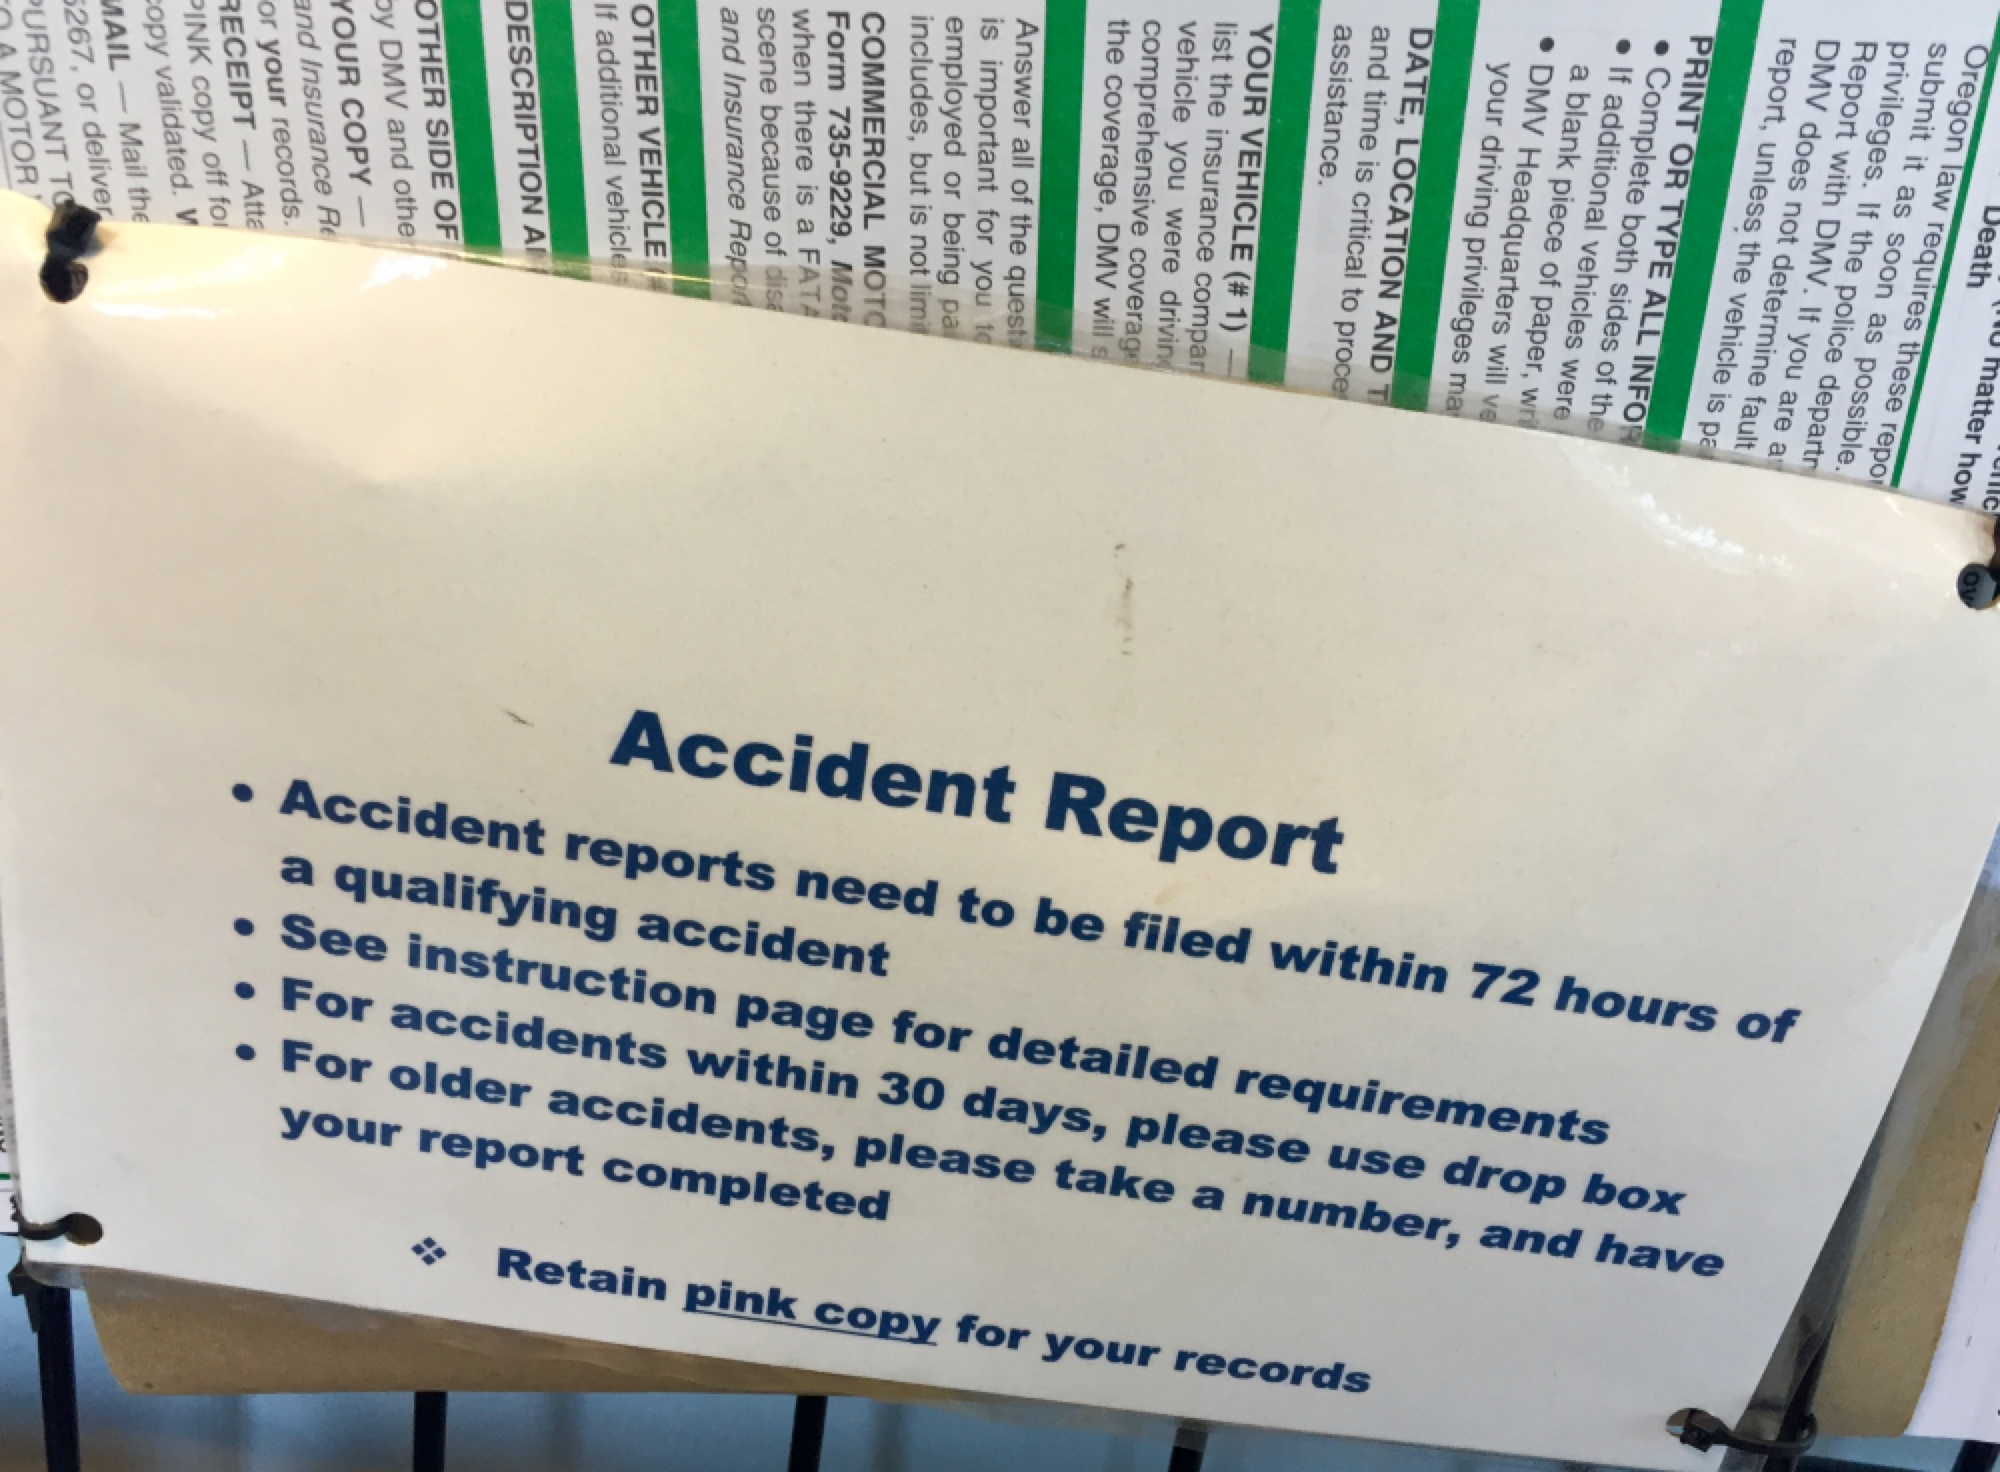 Crashes are still accidents at the Oregon DMV - BikePortland org